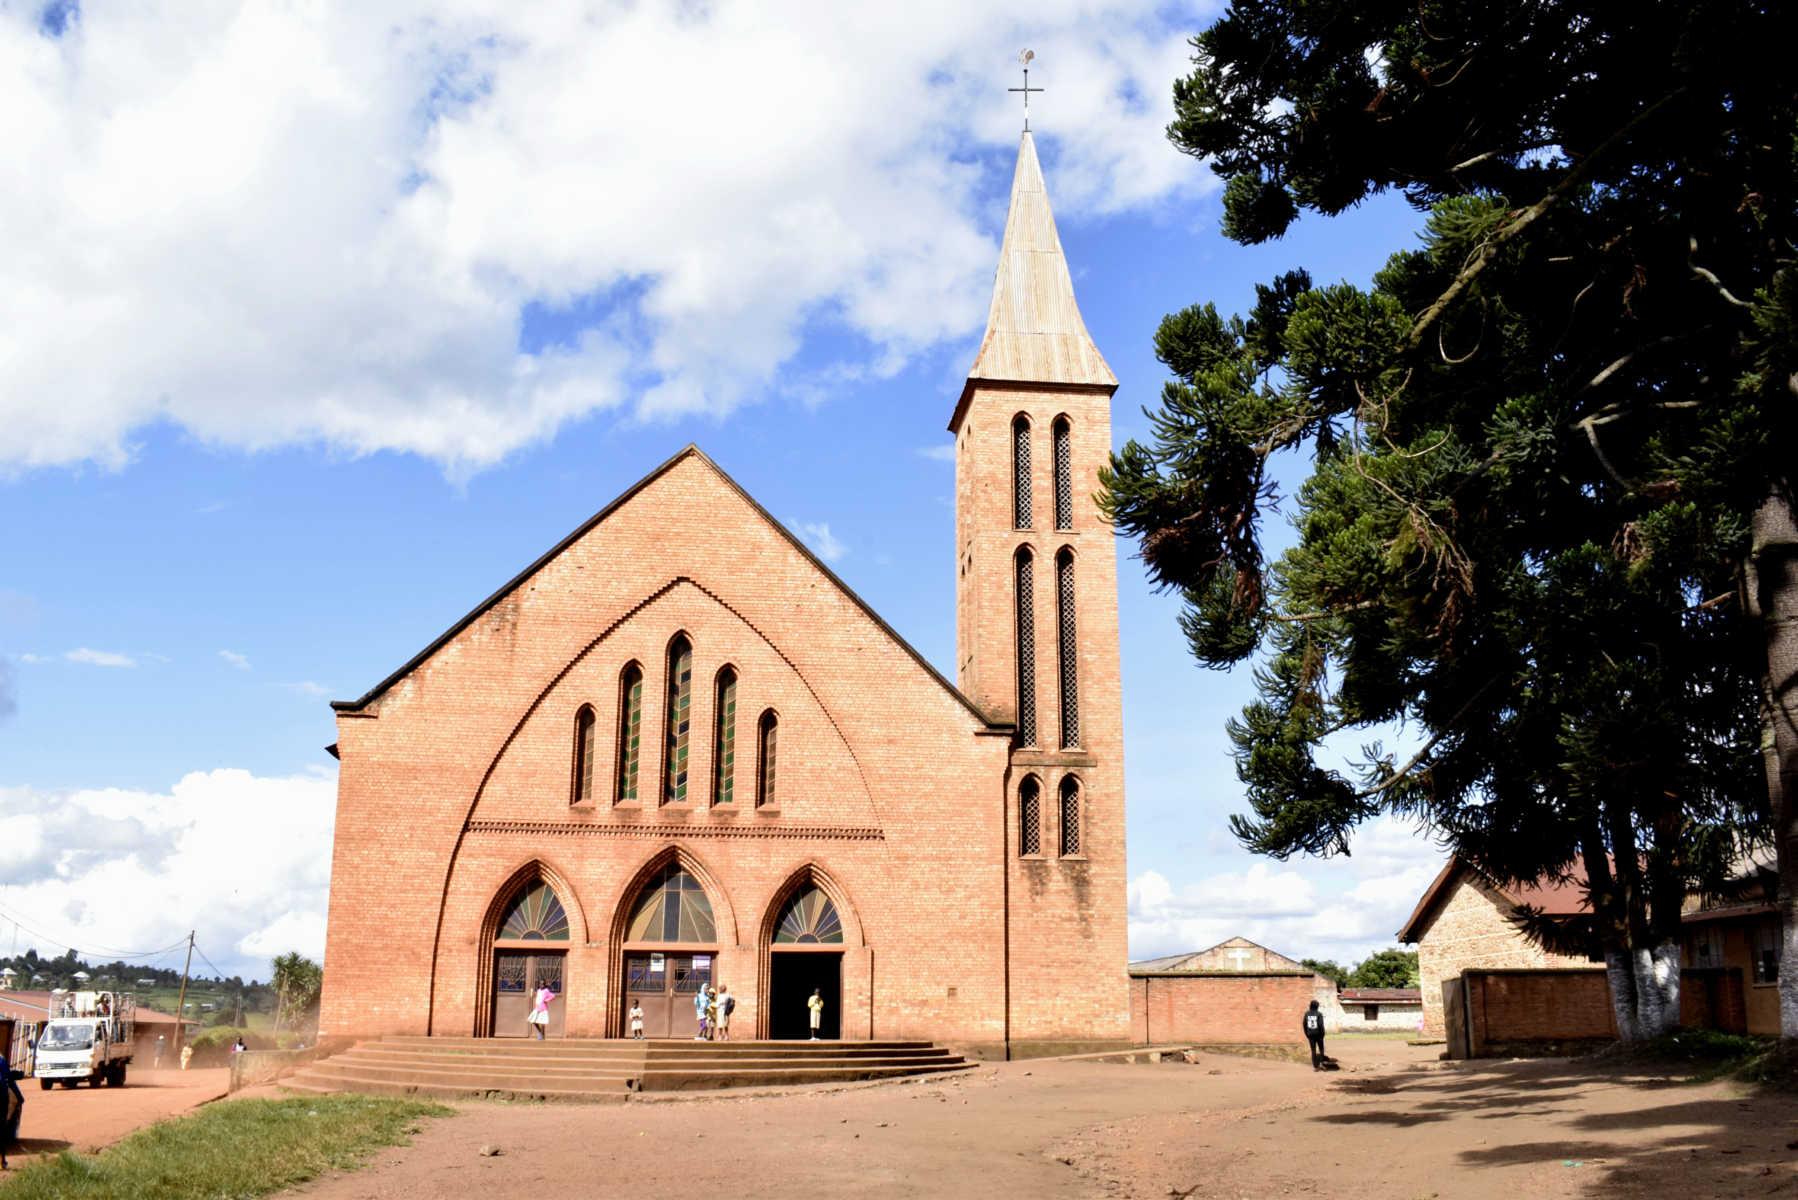 Burundi Architecture Tour